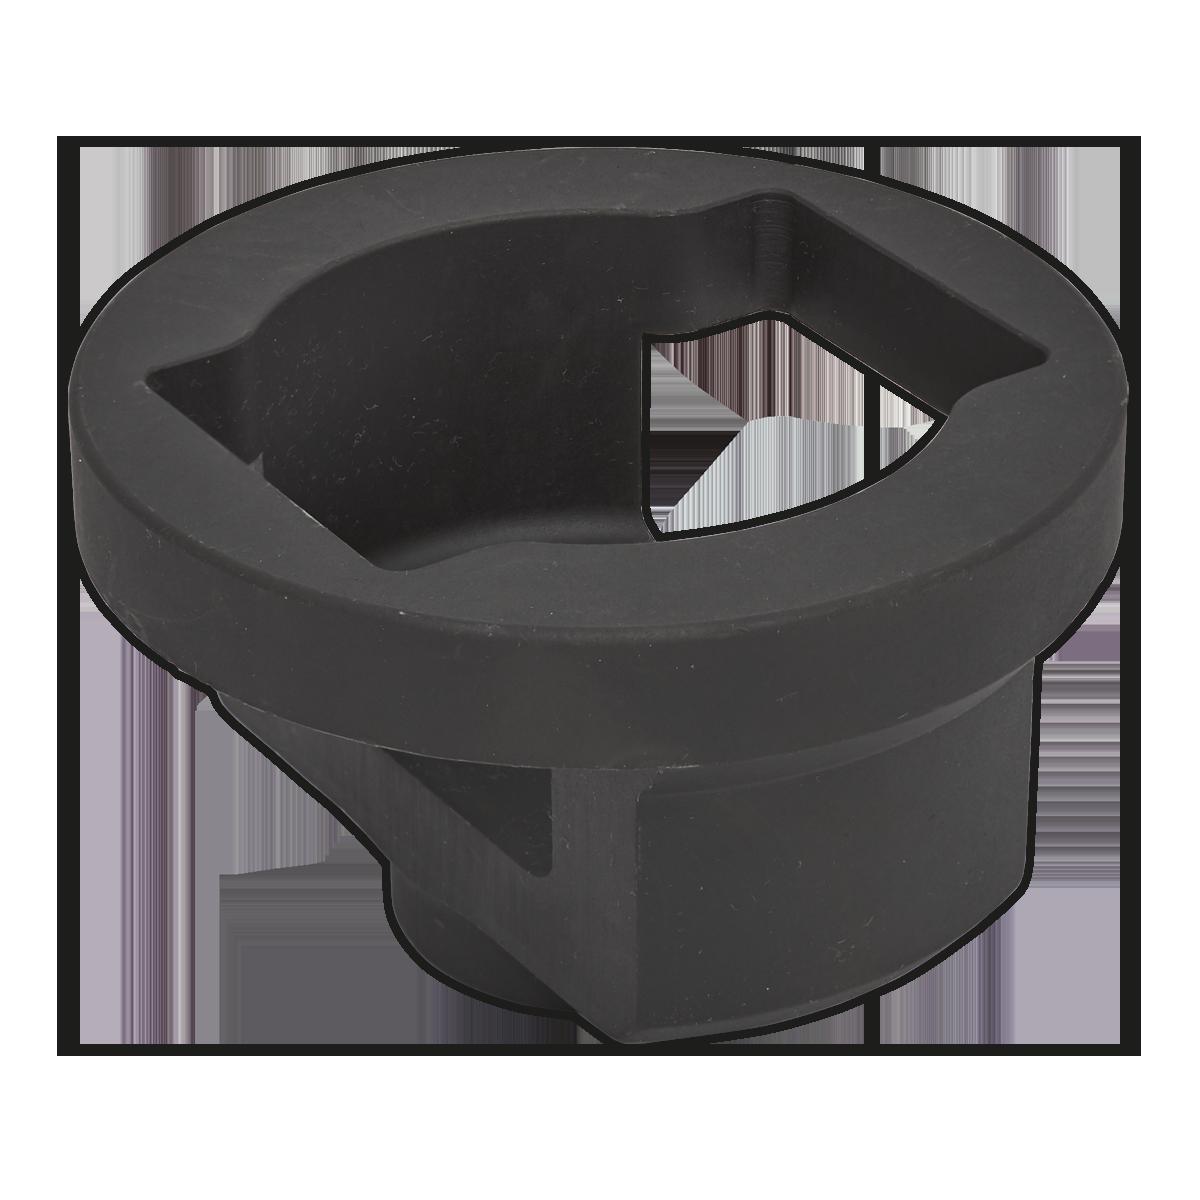 "Axle Nut Socket for BPW 12tonne Roller Bearings 3/4""Sq Drive"